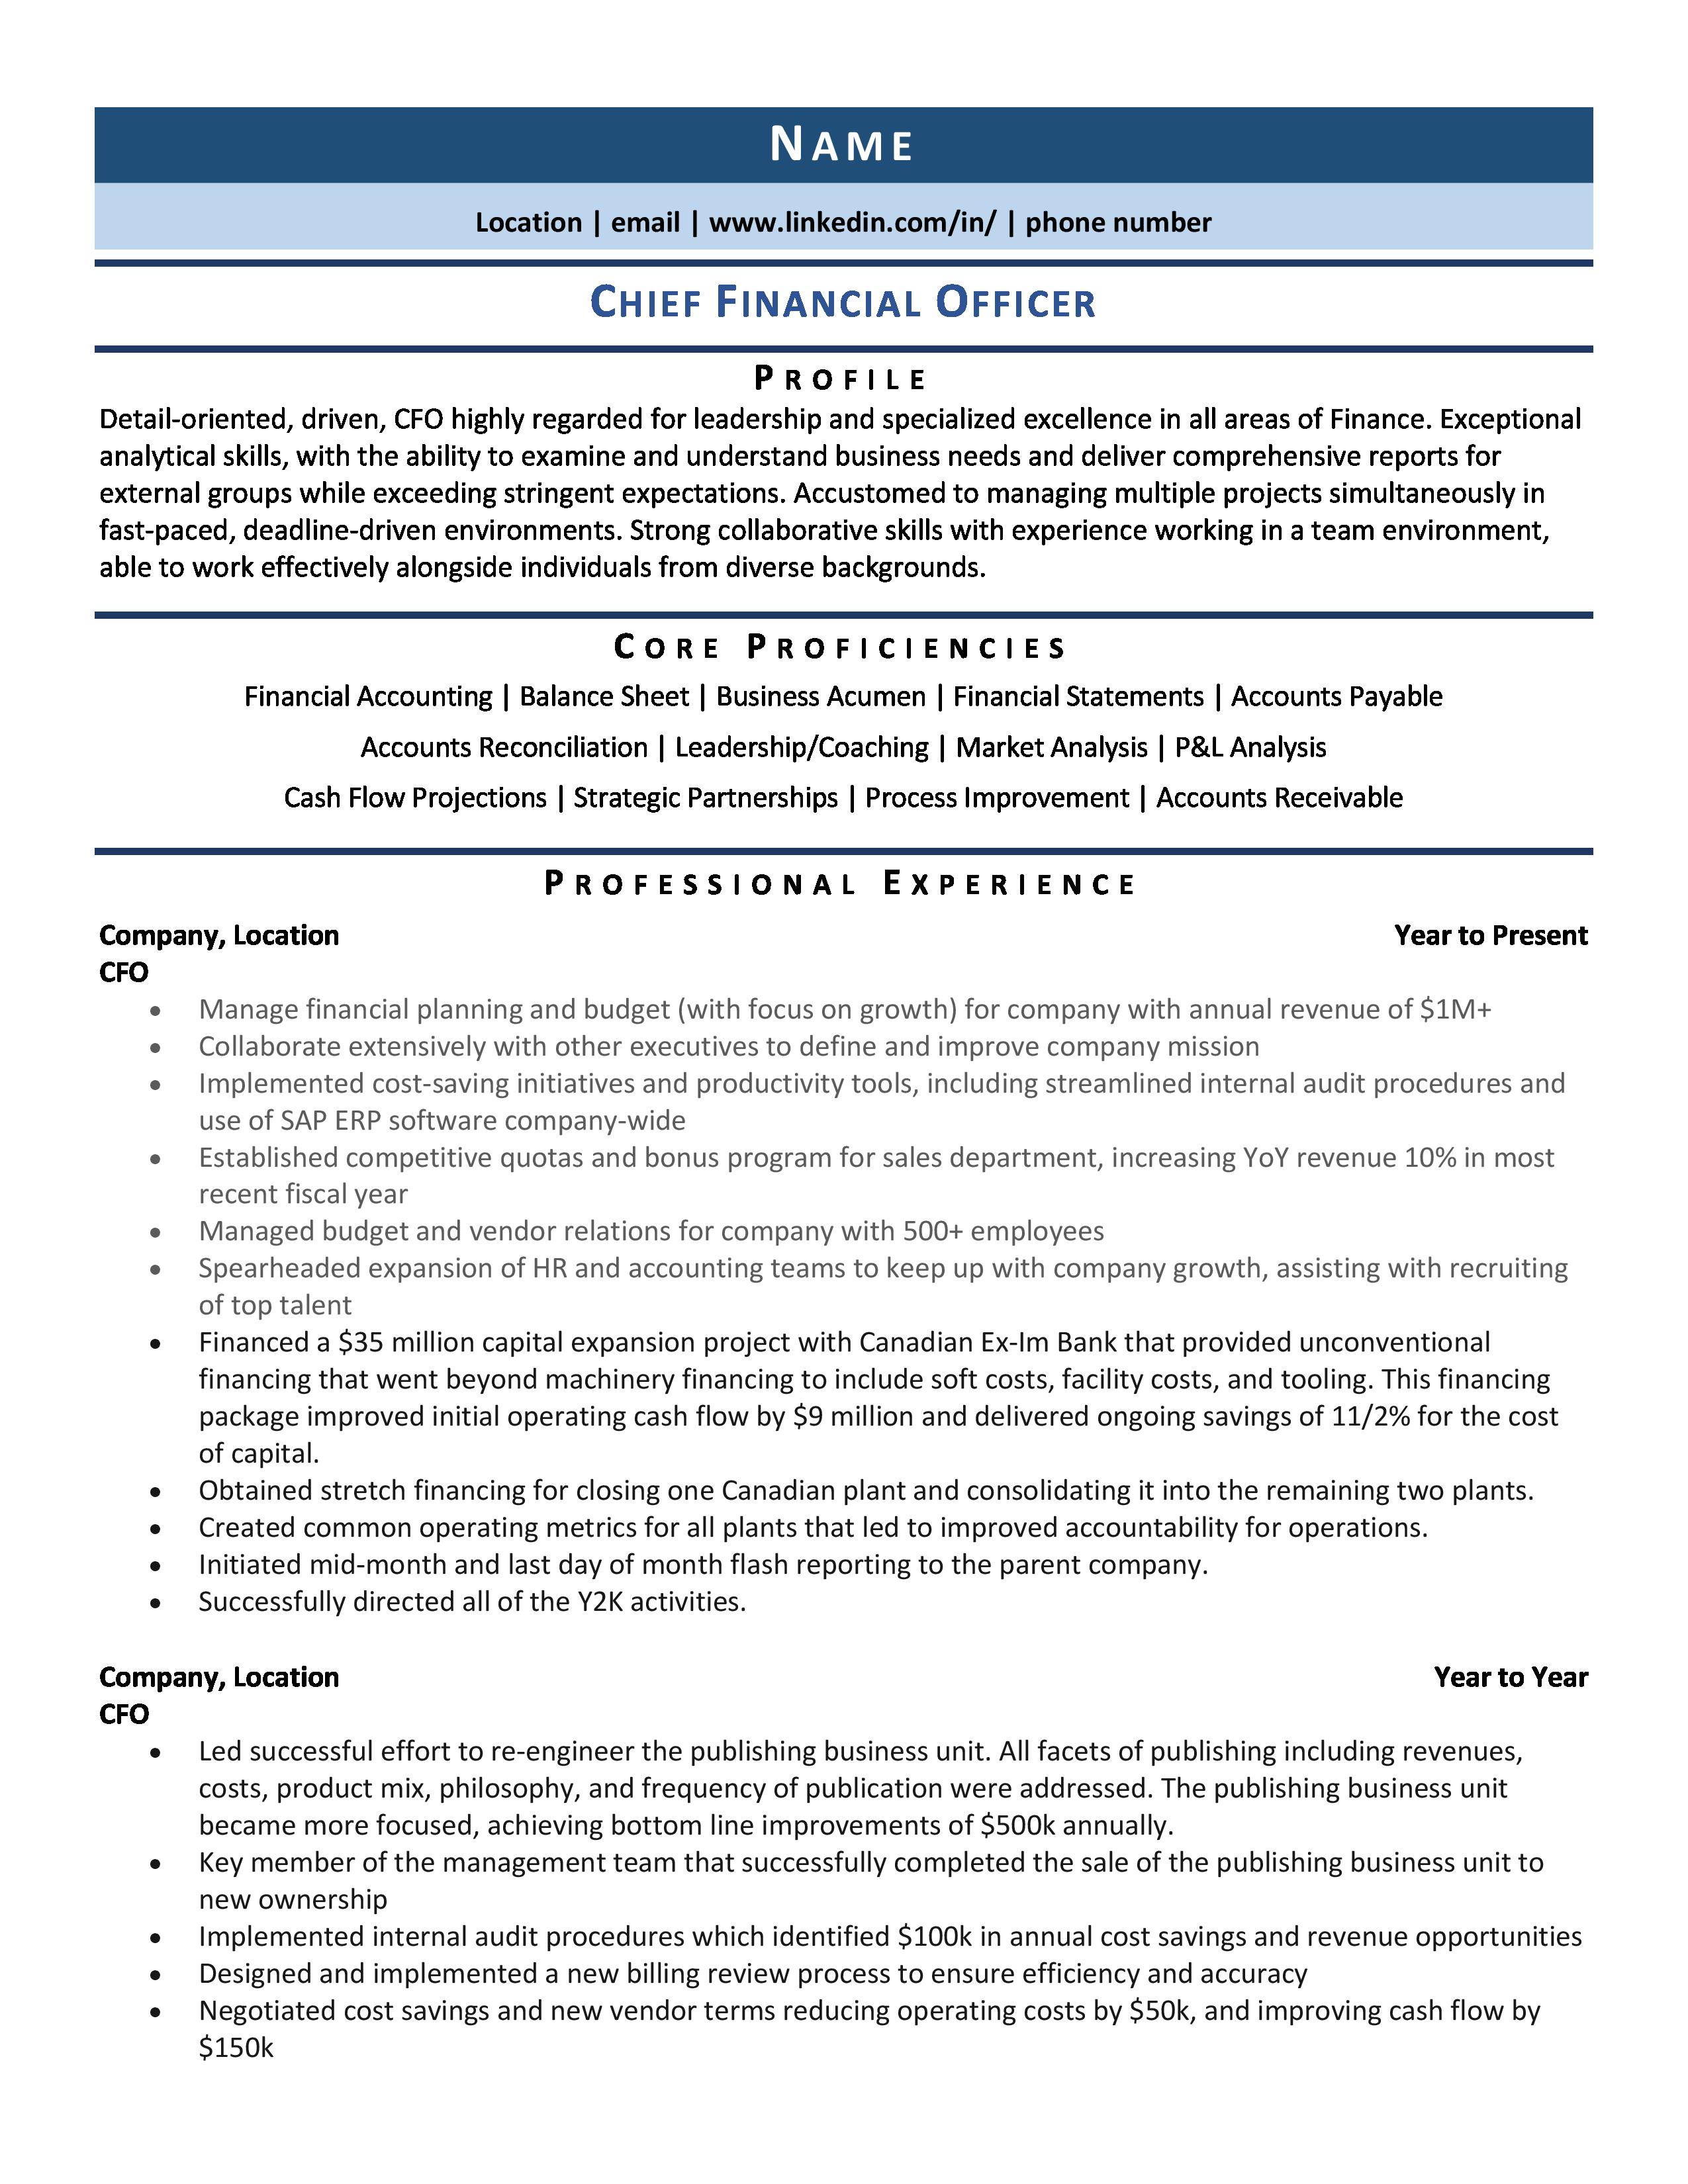 Chief Financial Officer Cfo Resume Samples Template Guide Chief Financial Officer Cfo Resume